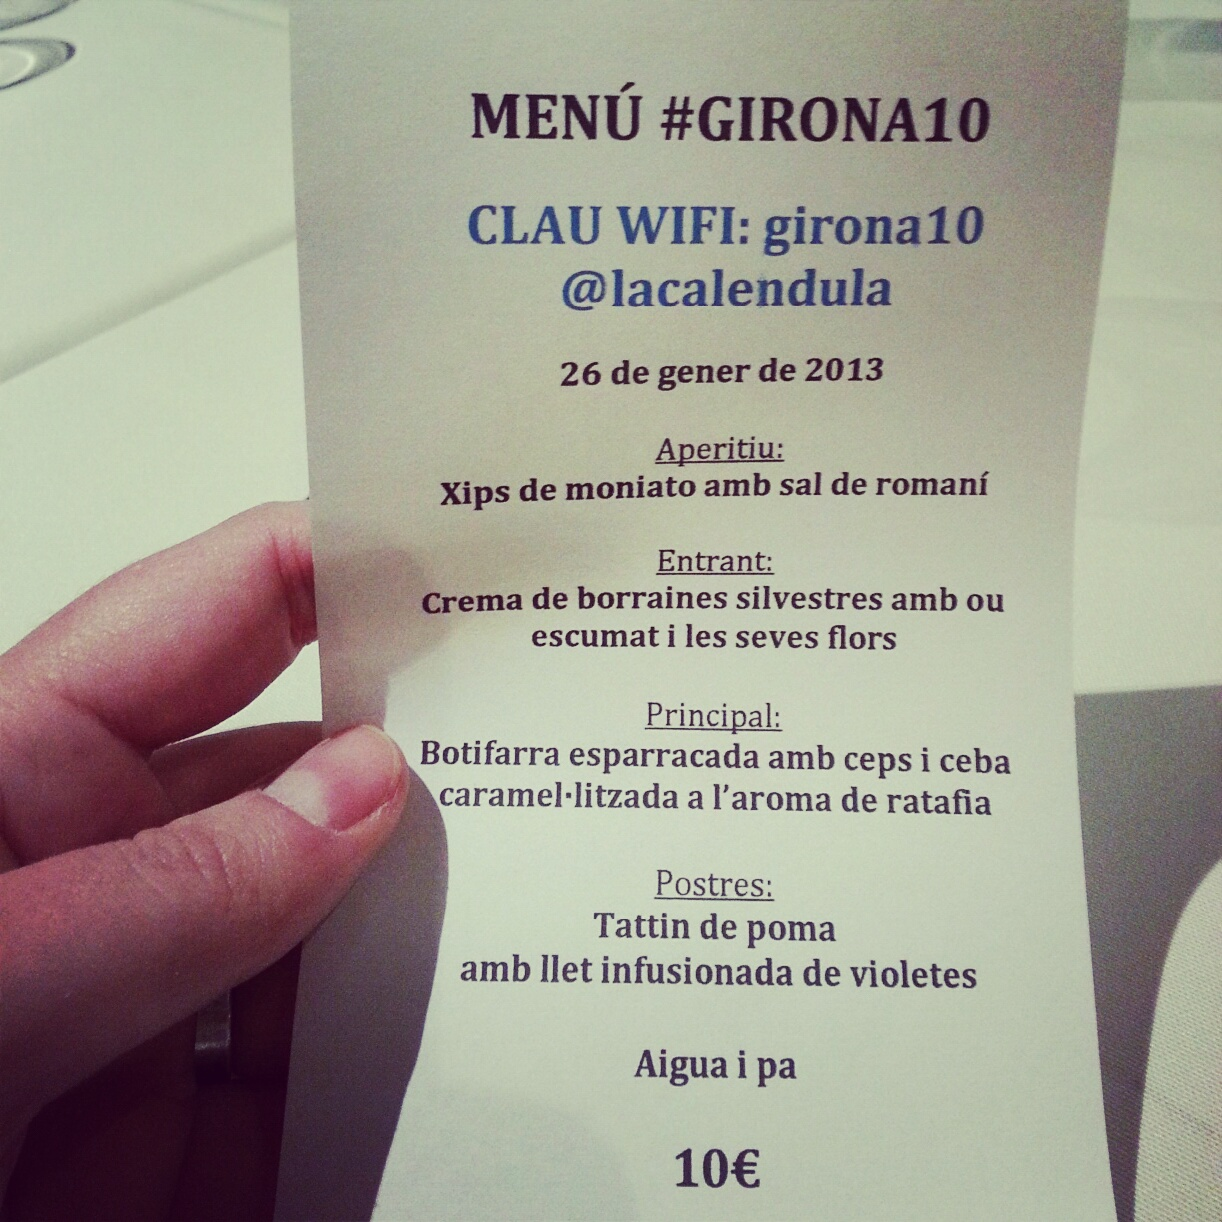 menu-girona10